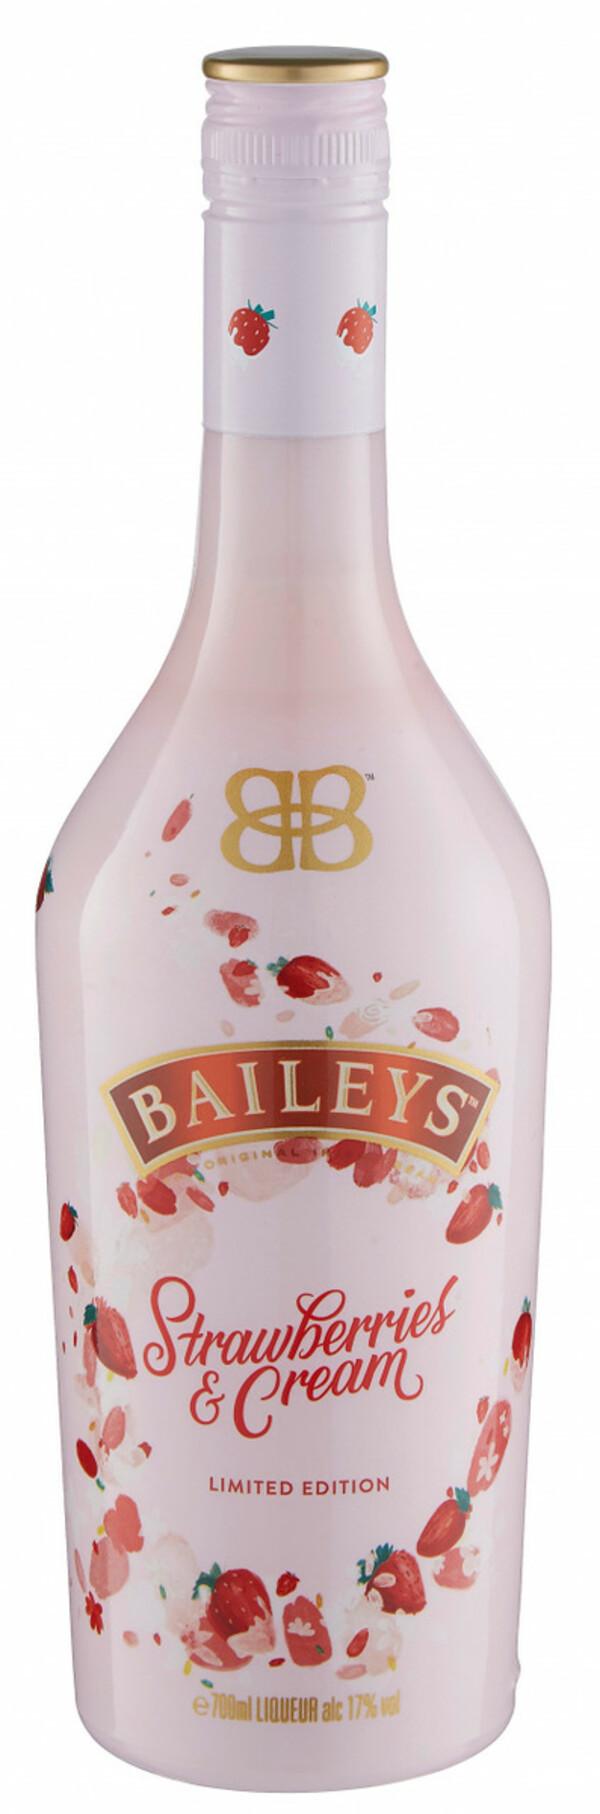 Baileys Im Angebot